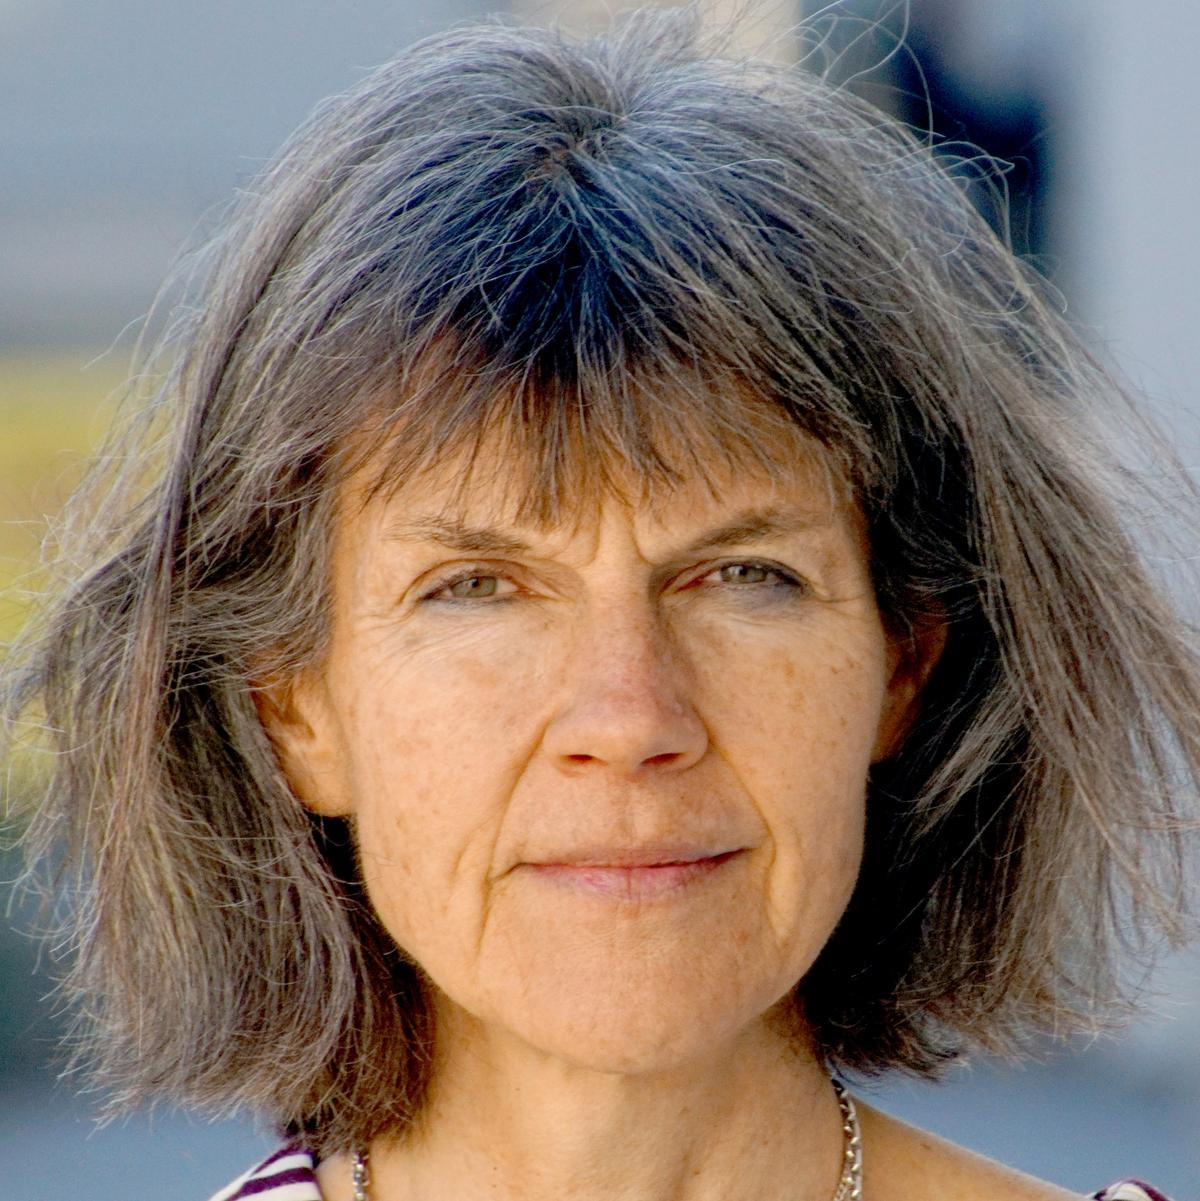 Birgit Harprath